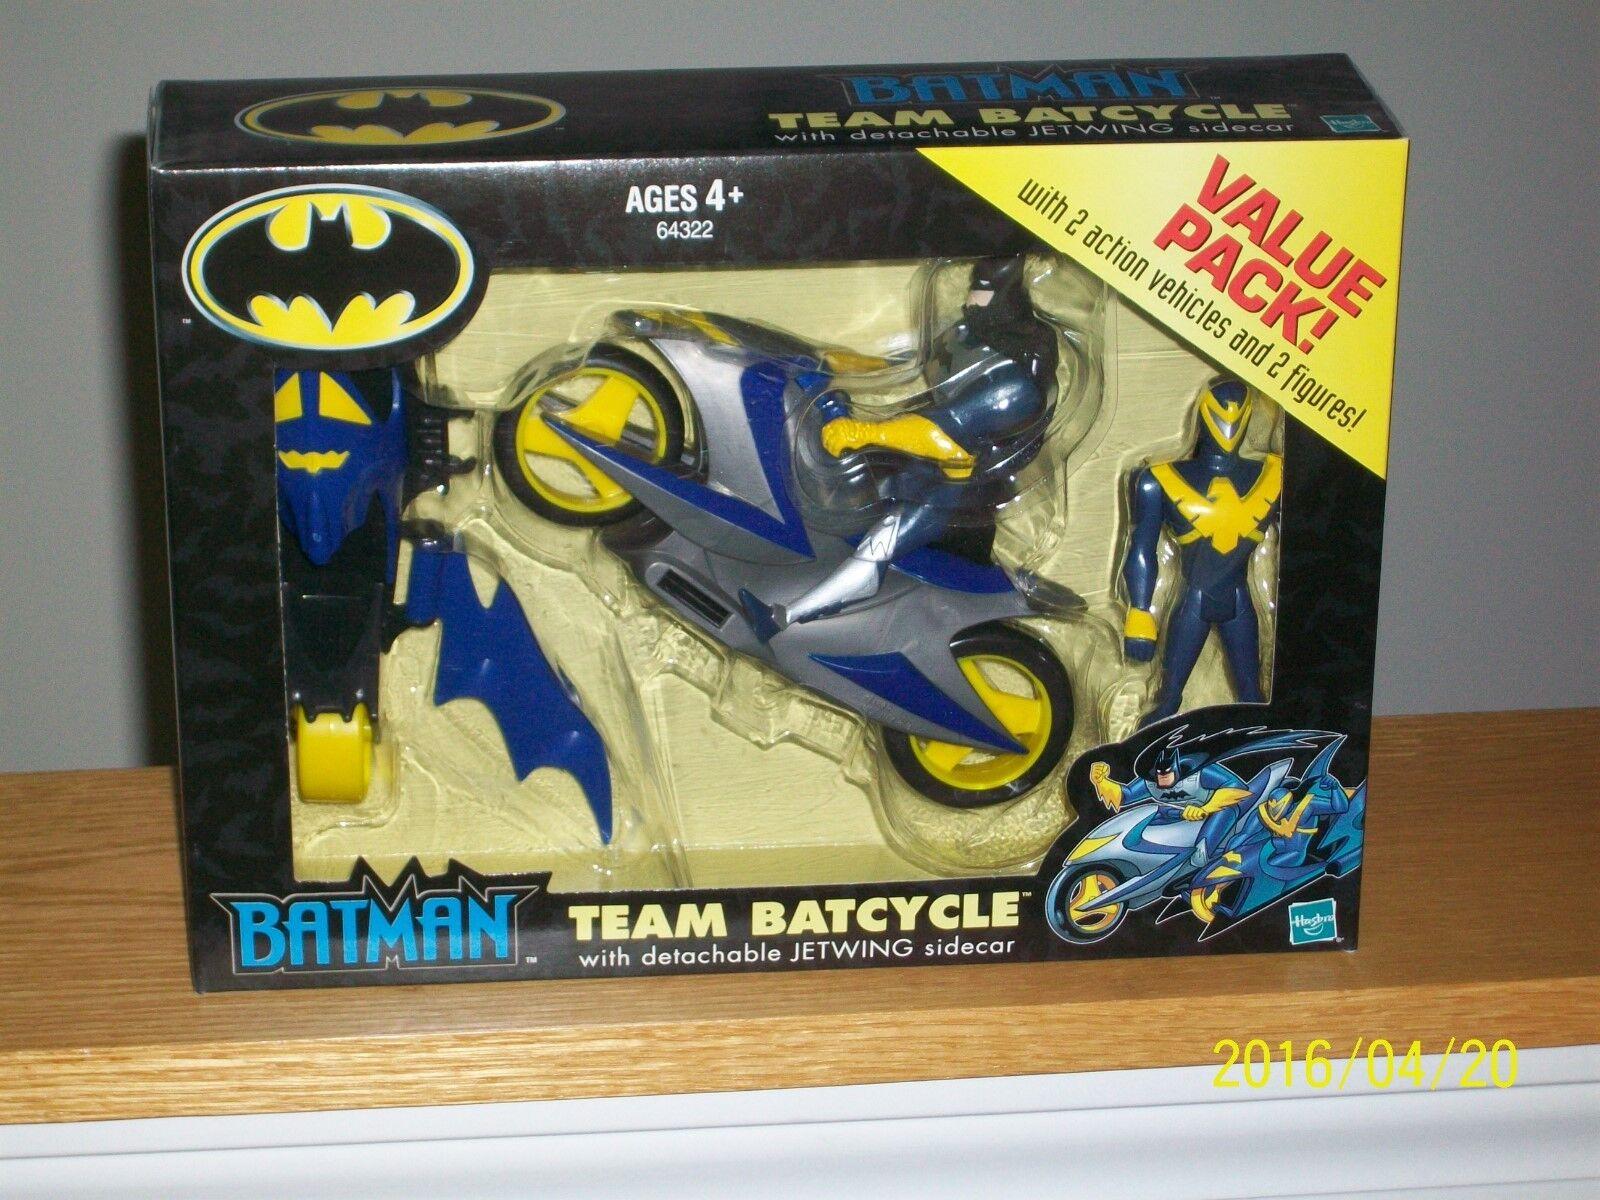 Hasbro batman - team batcycle mit nightwing und abnehmbare jetwing beiwagen